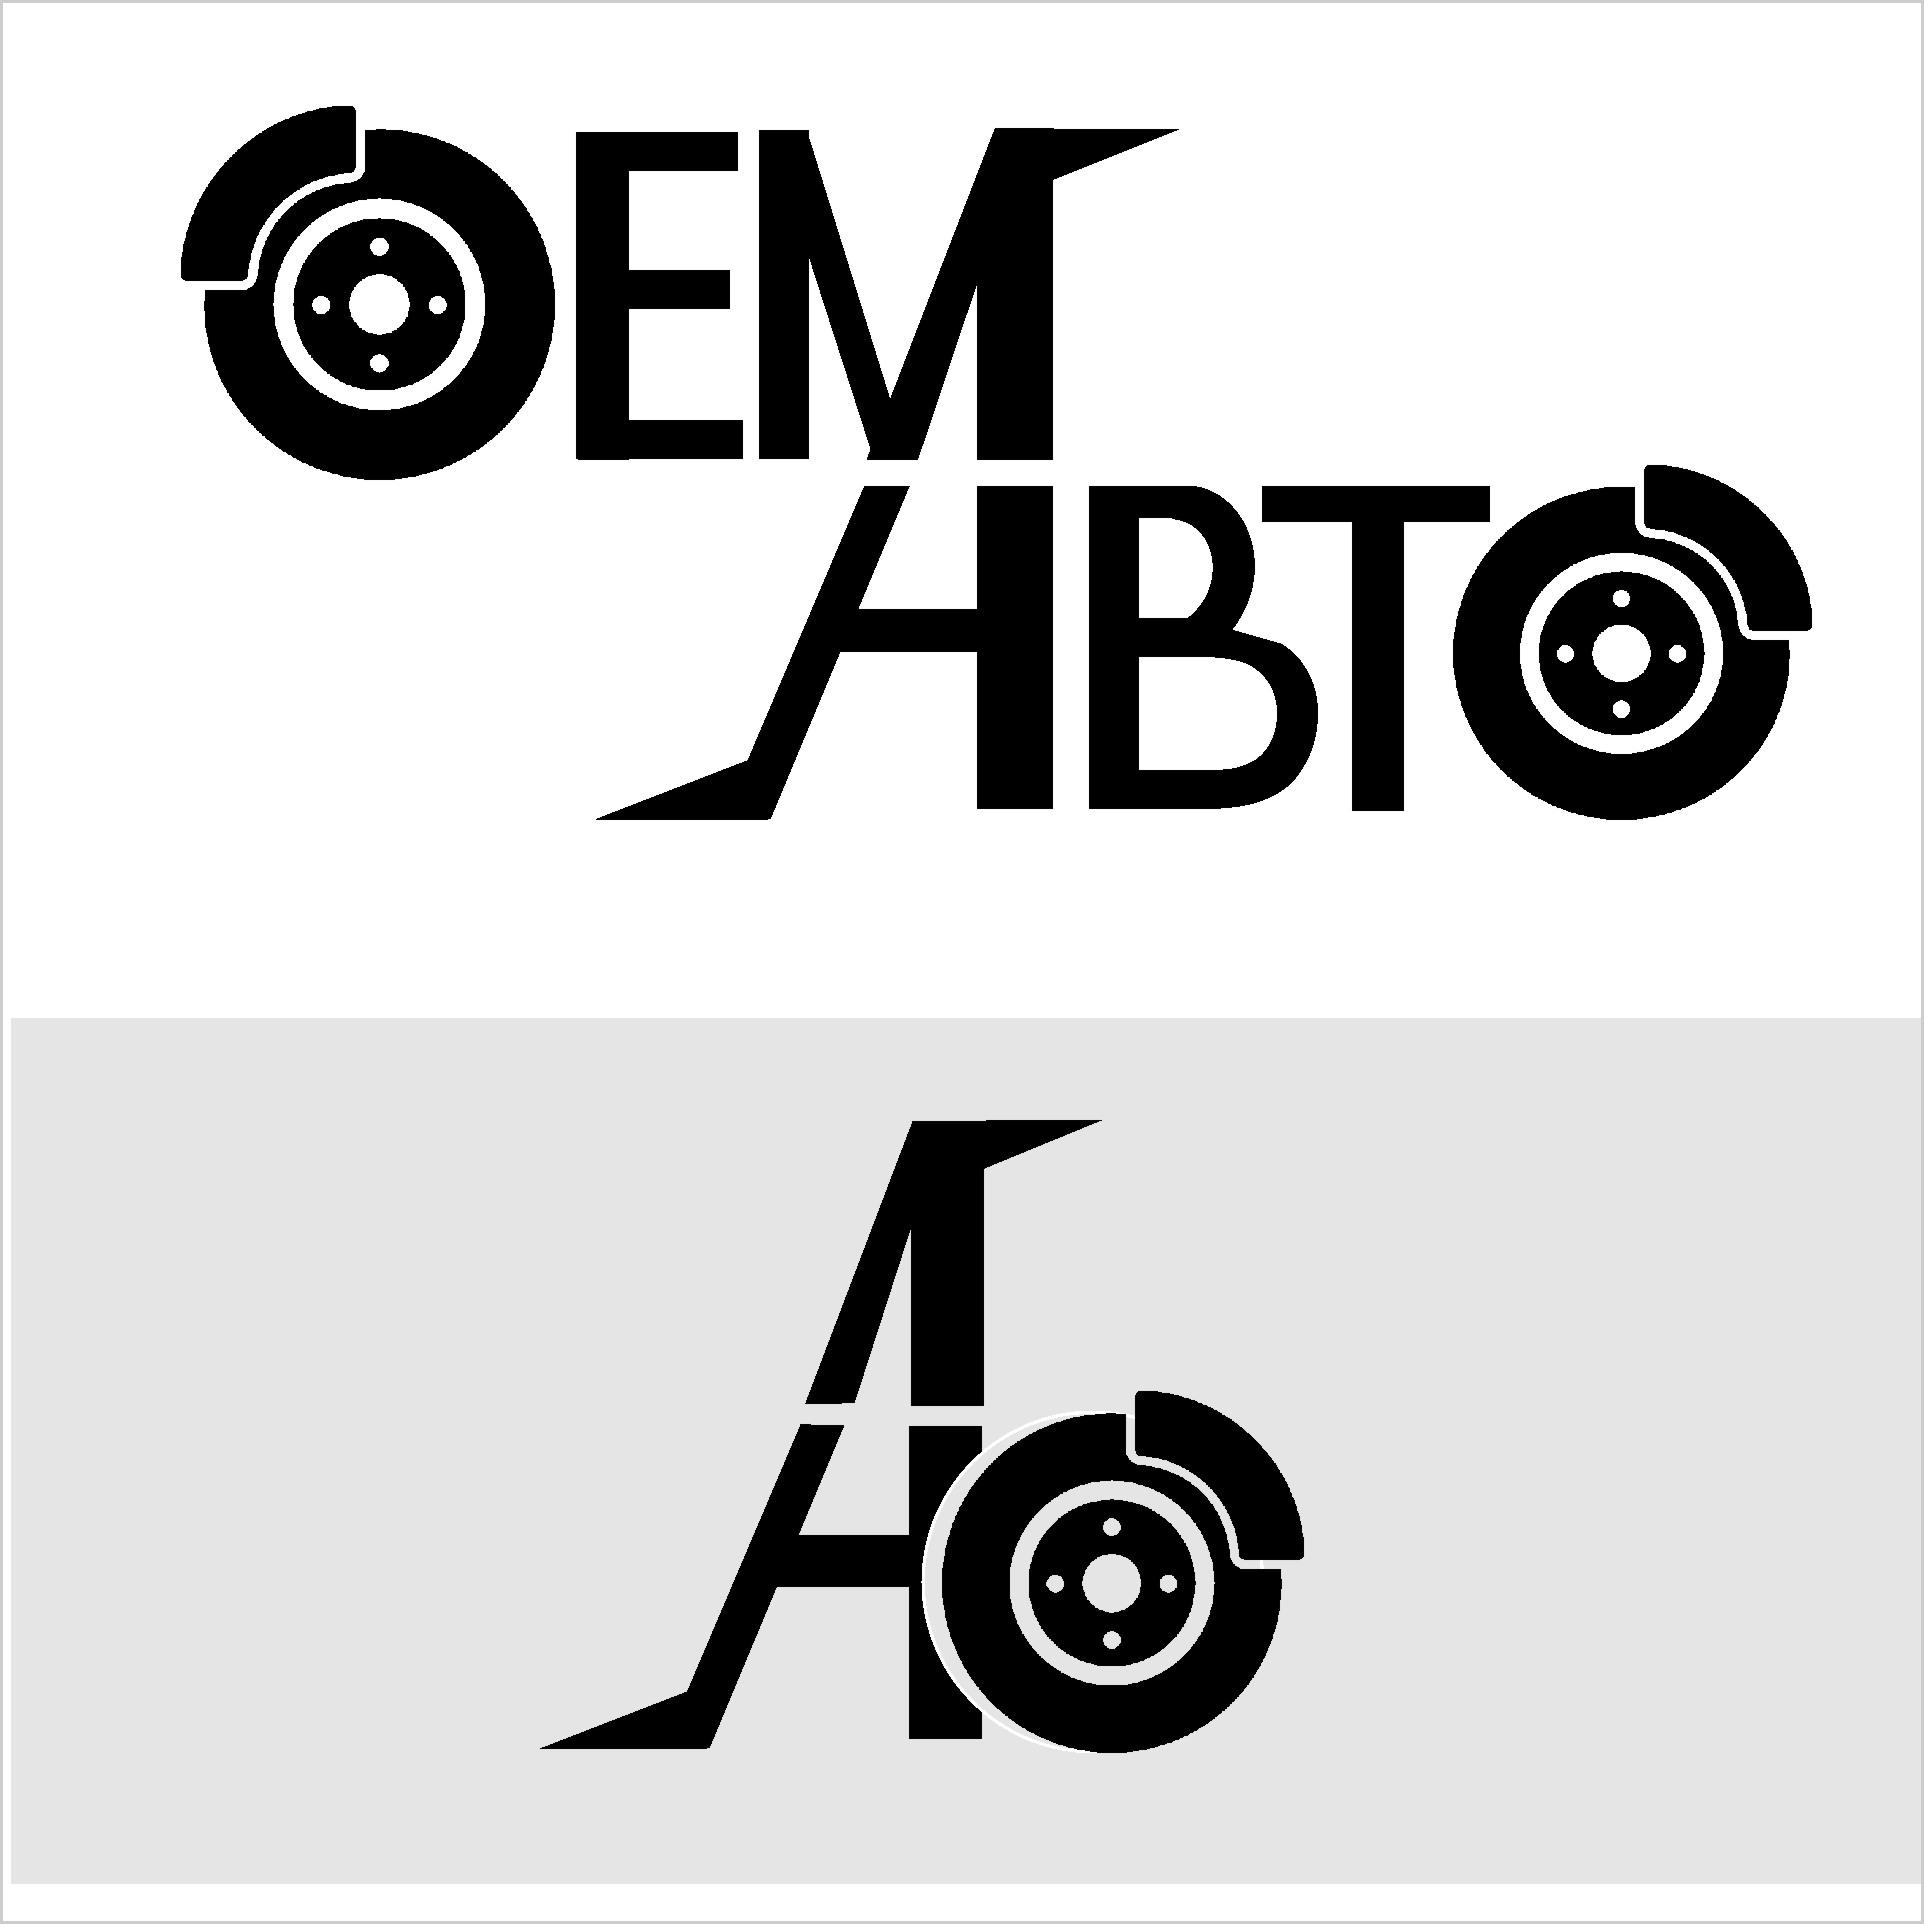 Разработать логотип и дизайн визитки  фото f_5455b697d66a89c0.jpg